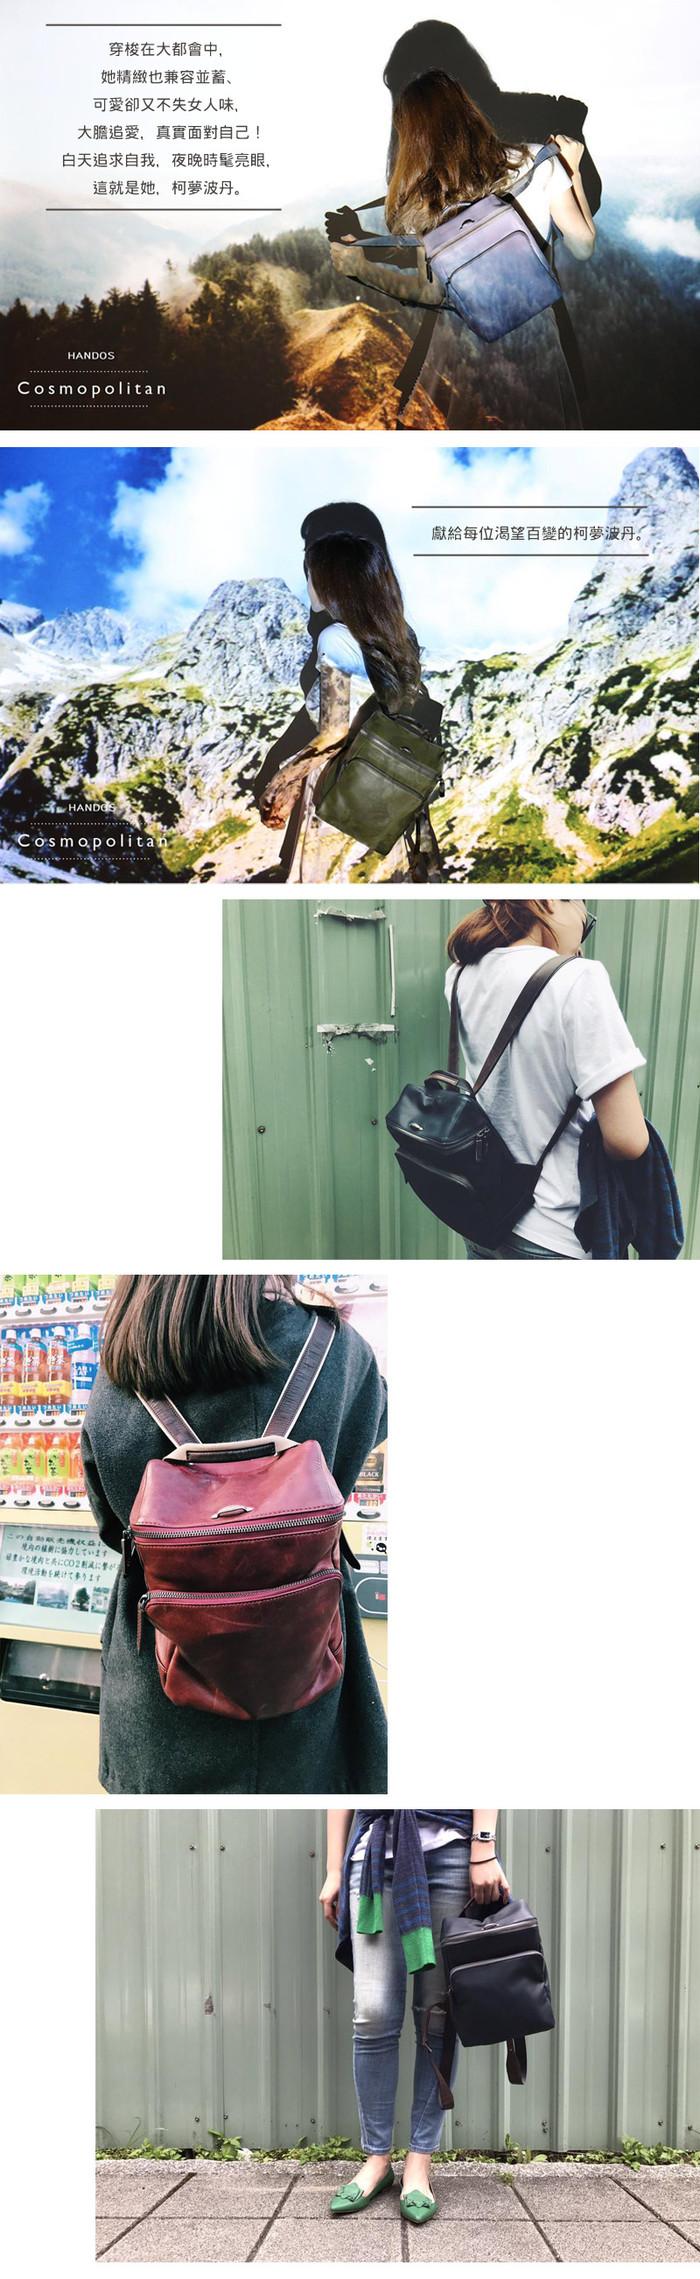 (複製)HANDOS|  Acordeon 三折風琴肩背包 - 墨水藍 x 羽毛白